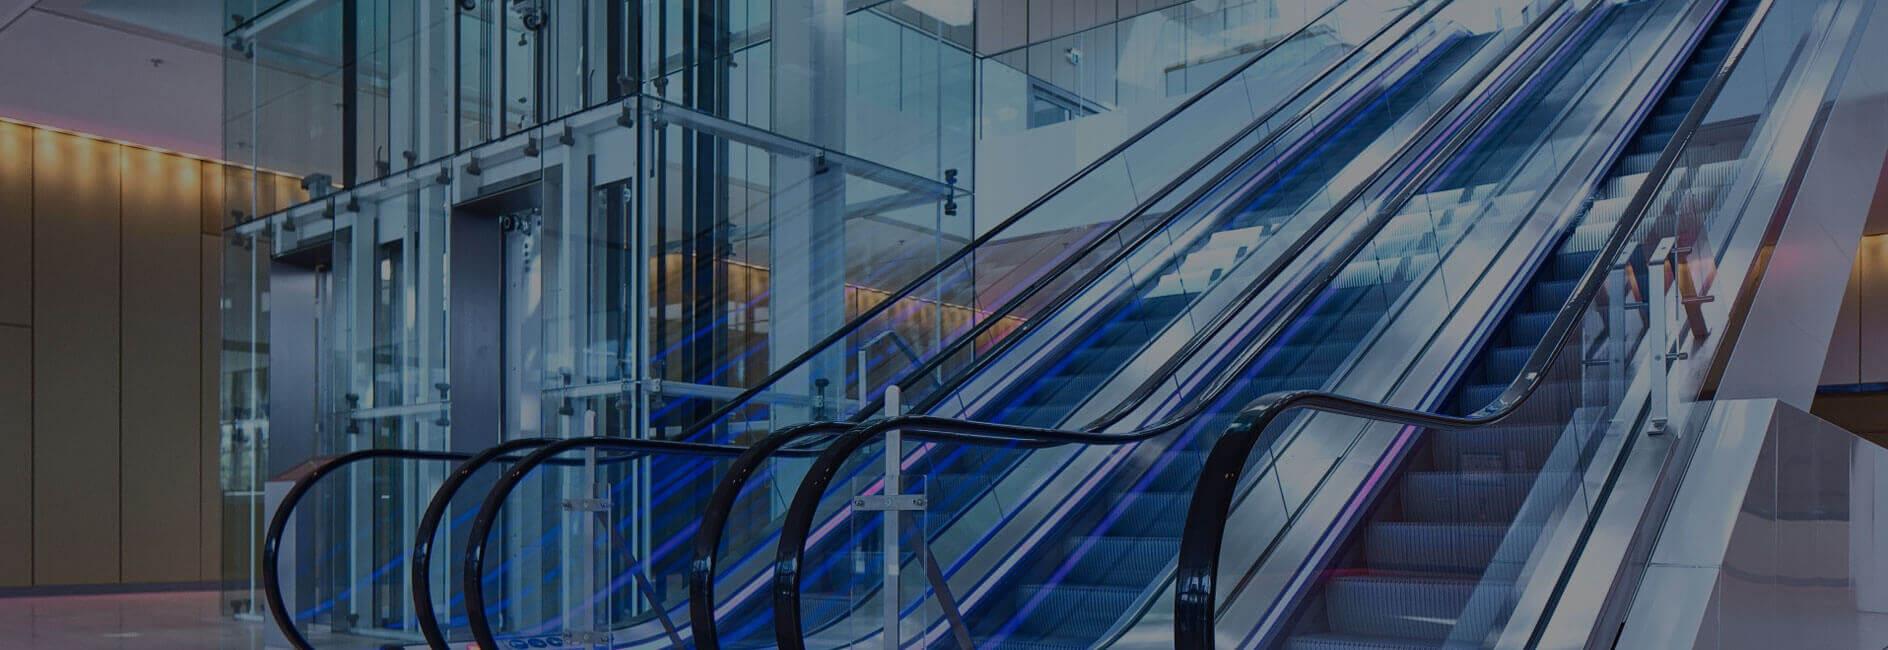 Yürüyen merdiven Ankara Üretim